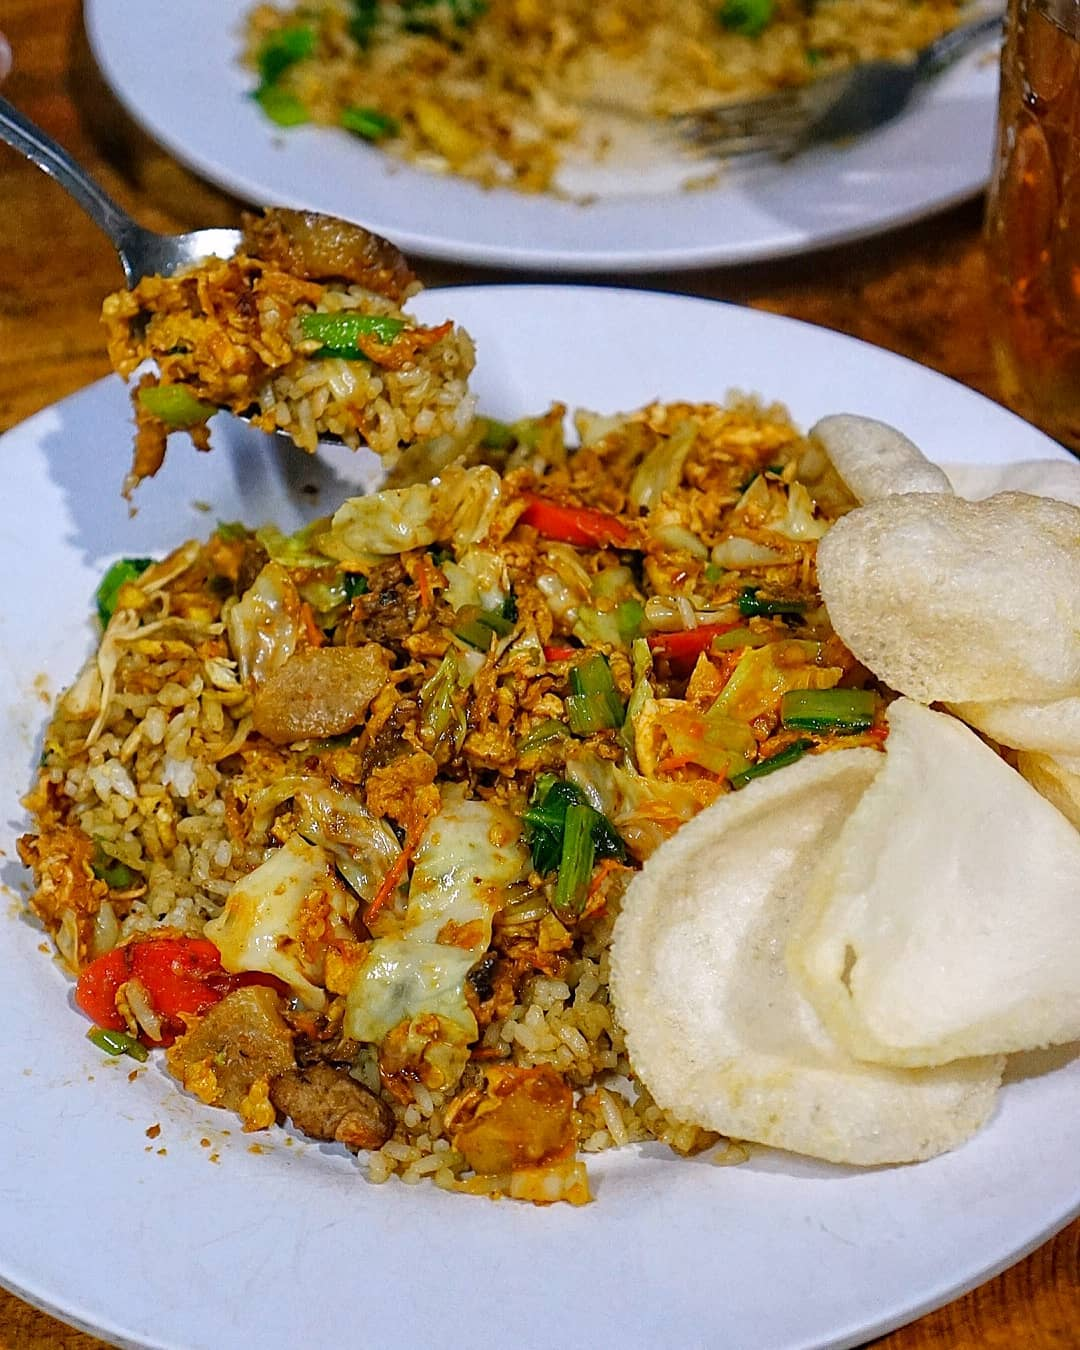 Resep Nasi Goreng Gila yang Bikin Kita Tergila-gila